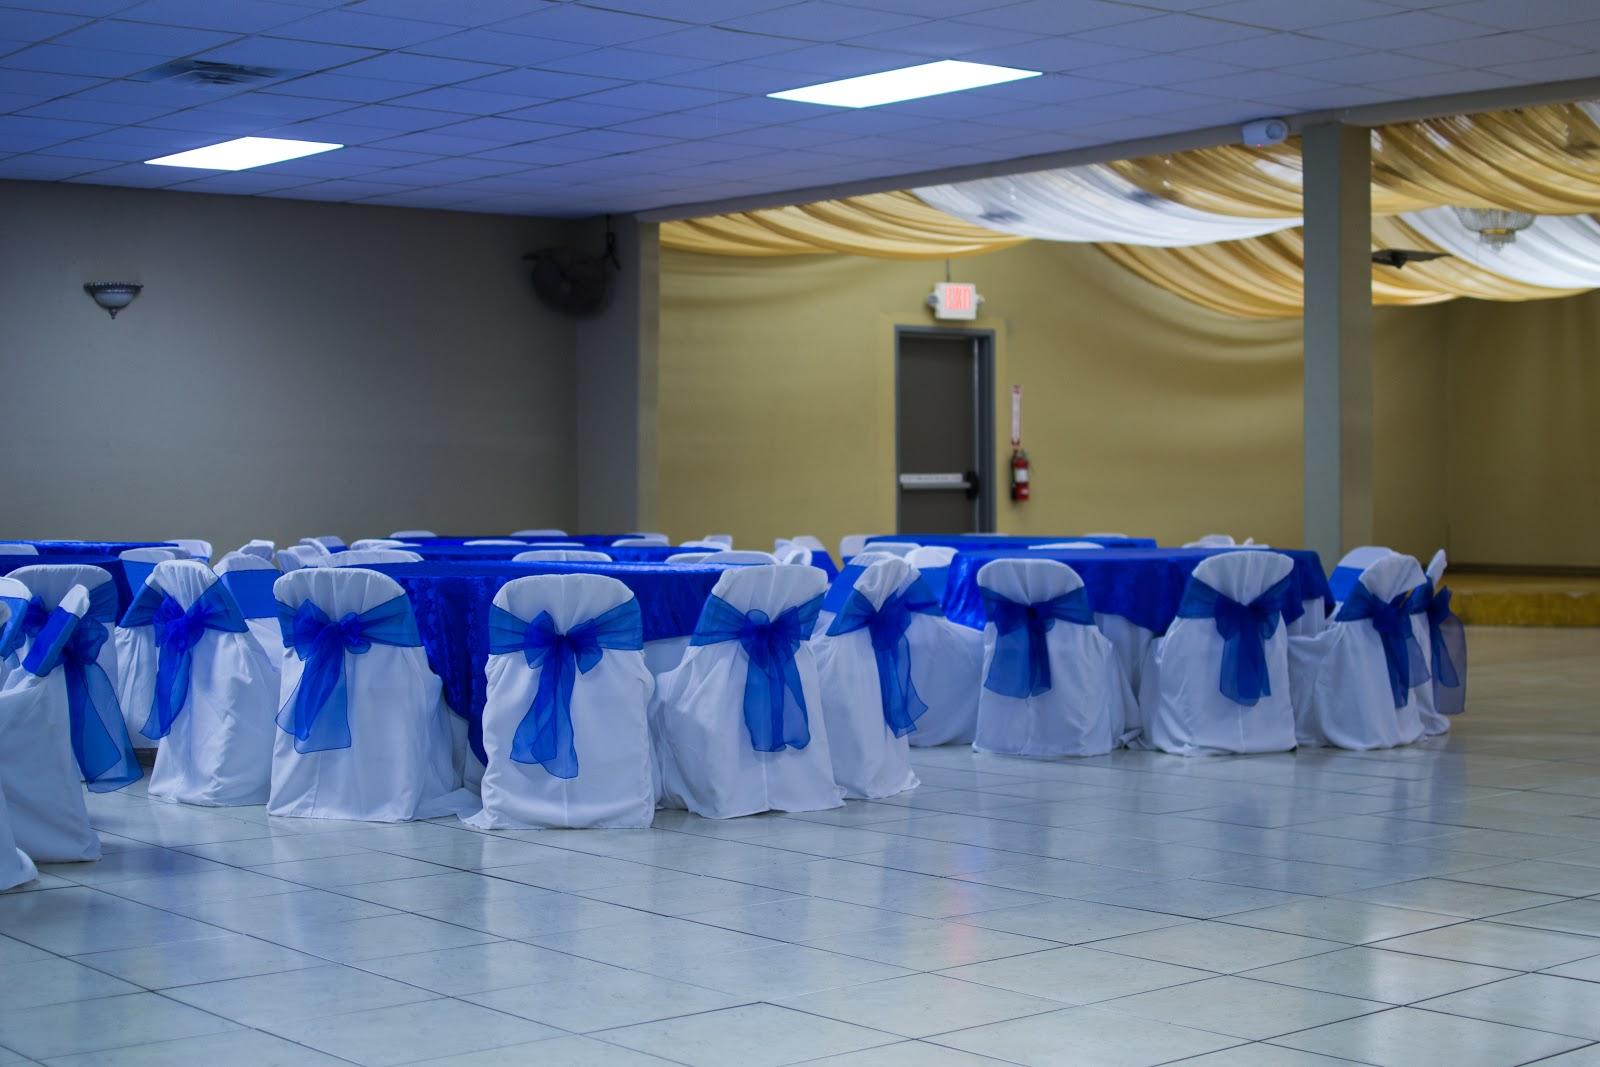 Rincon Real Hall Decorations Wedding Anniversary Reception